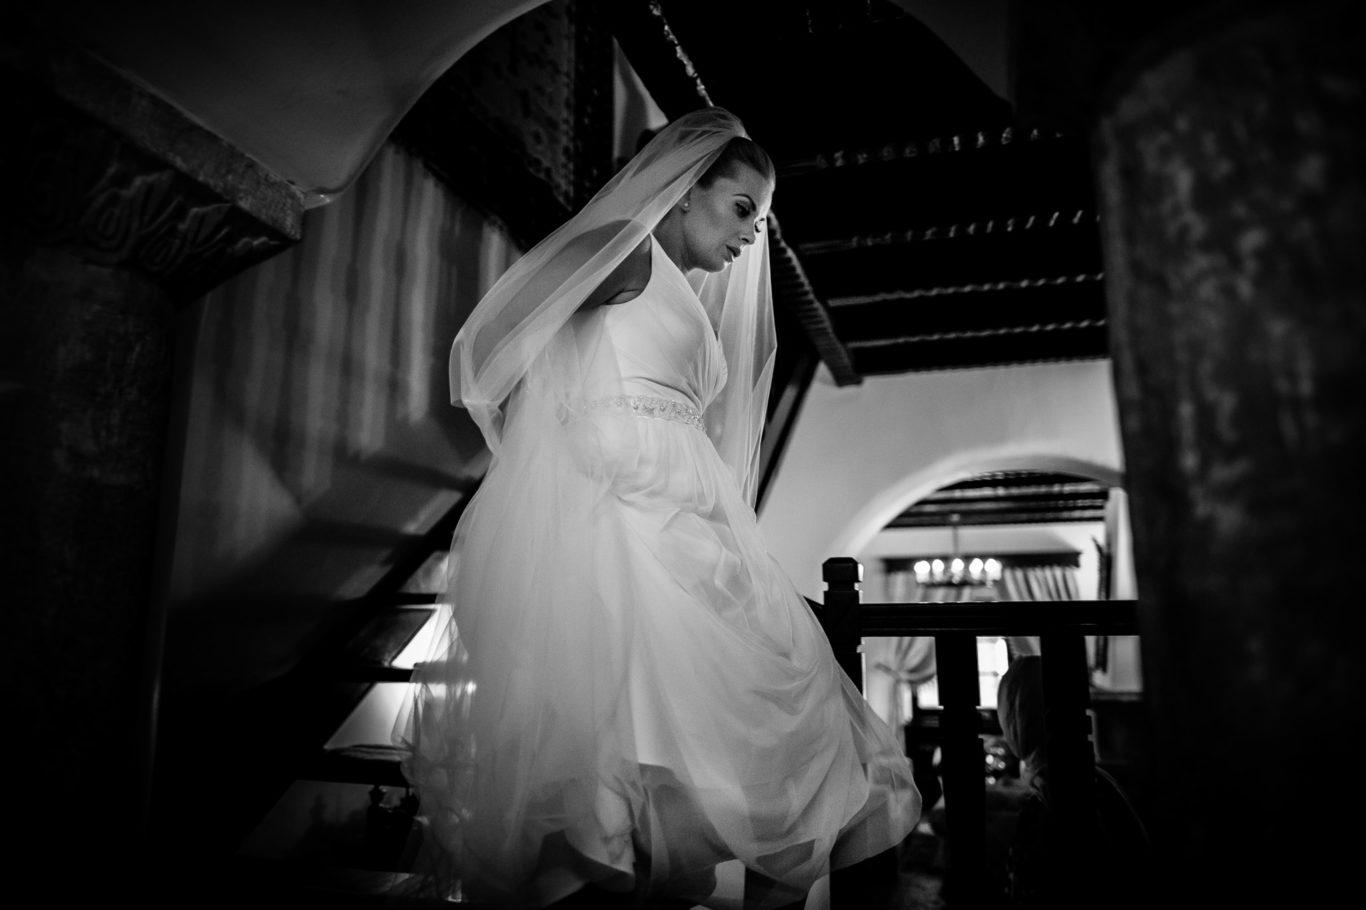 0213-fotoreportaj-nunta-conacul-maldar-cristina-stefan-fotograf-ciprian-dumitrescu-dc1_2399